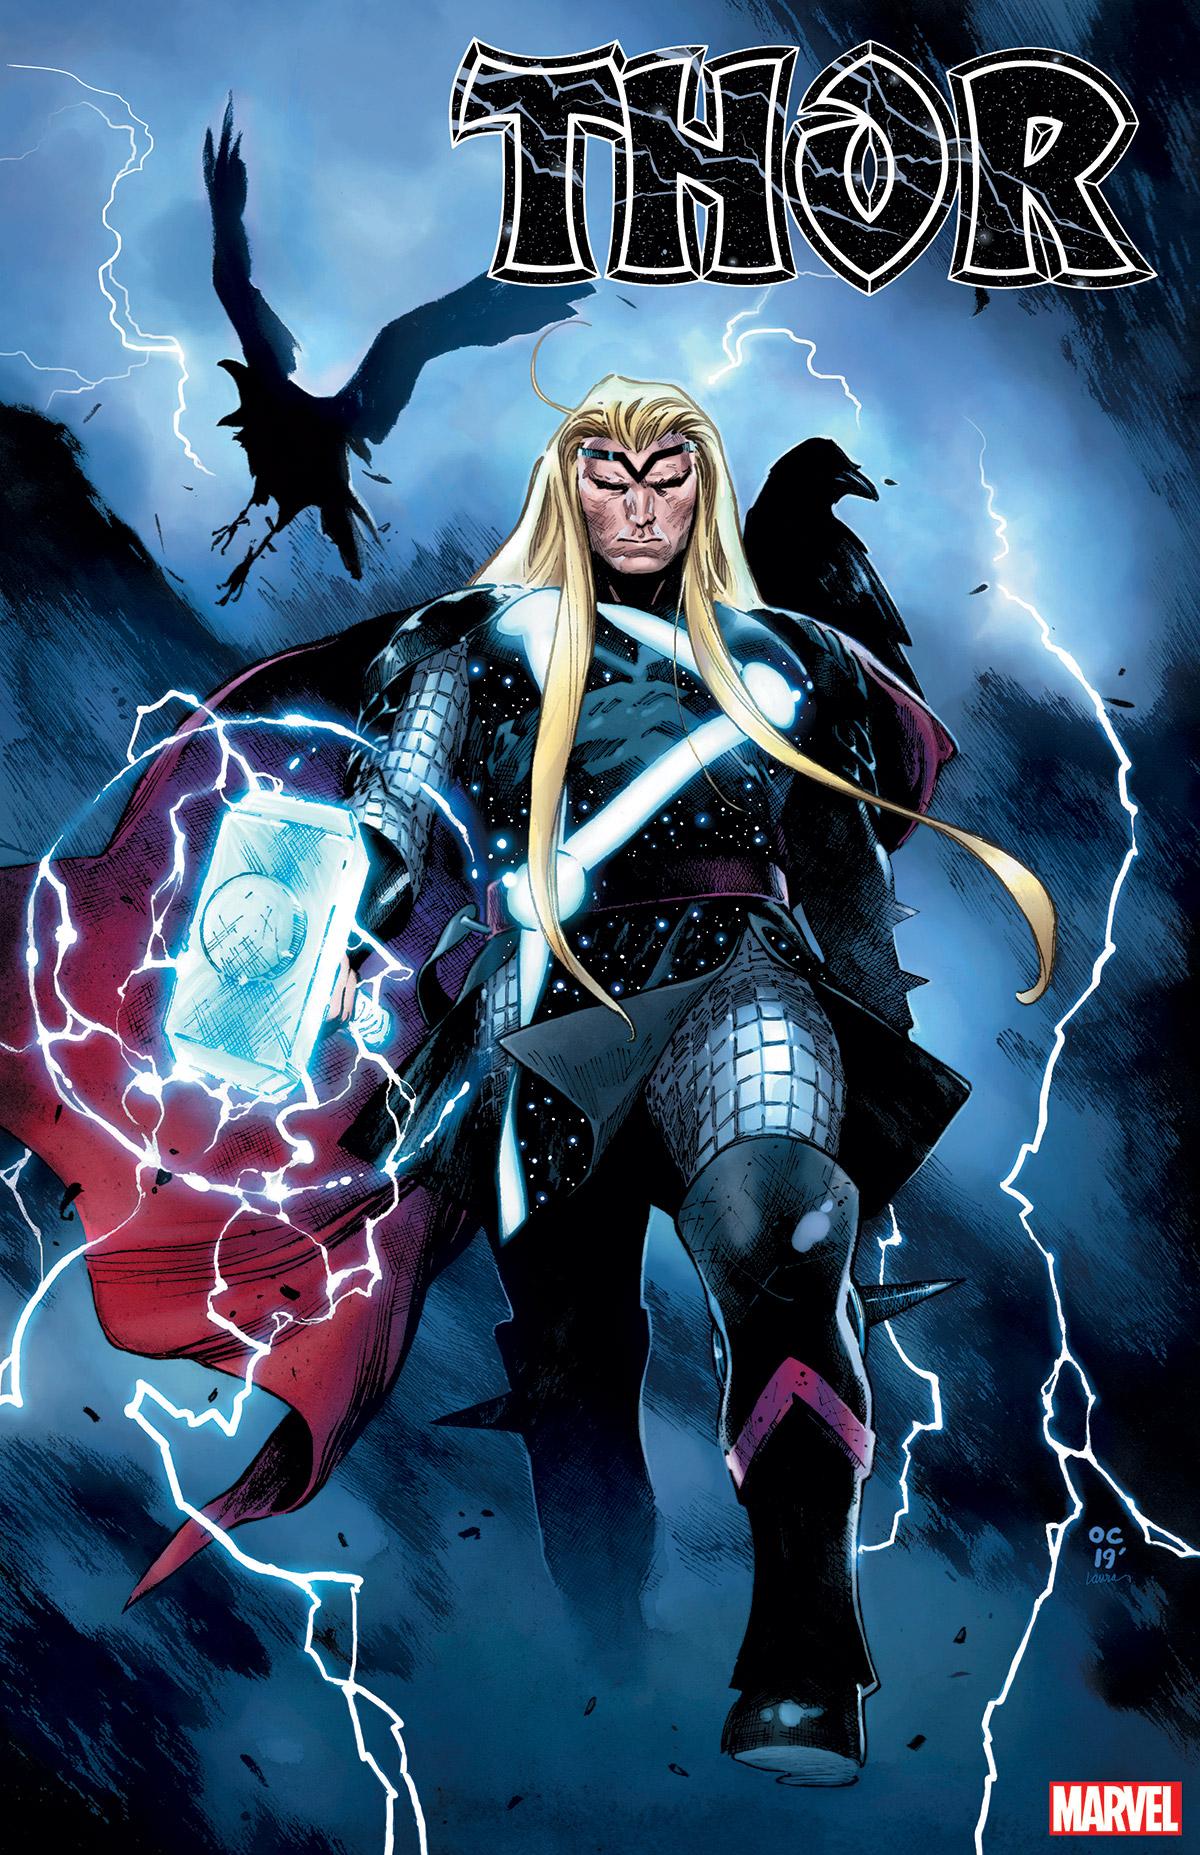 Thor #1